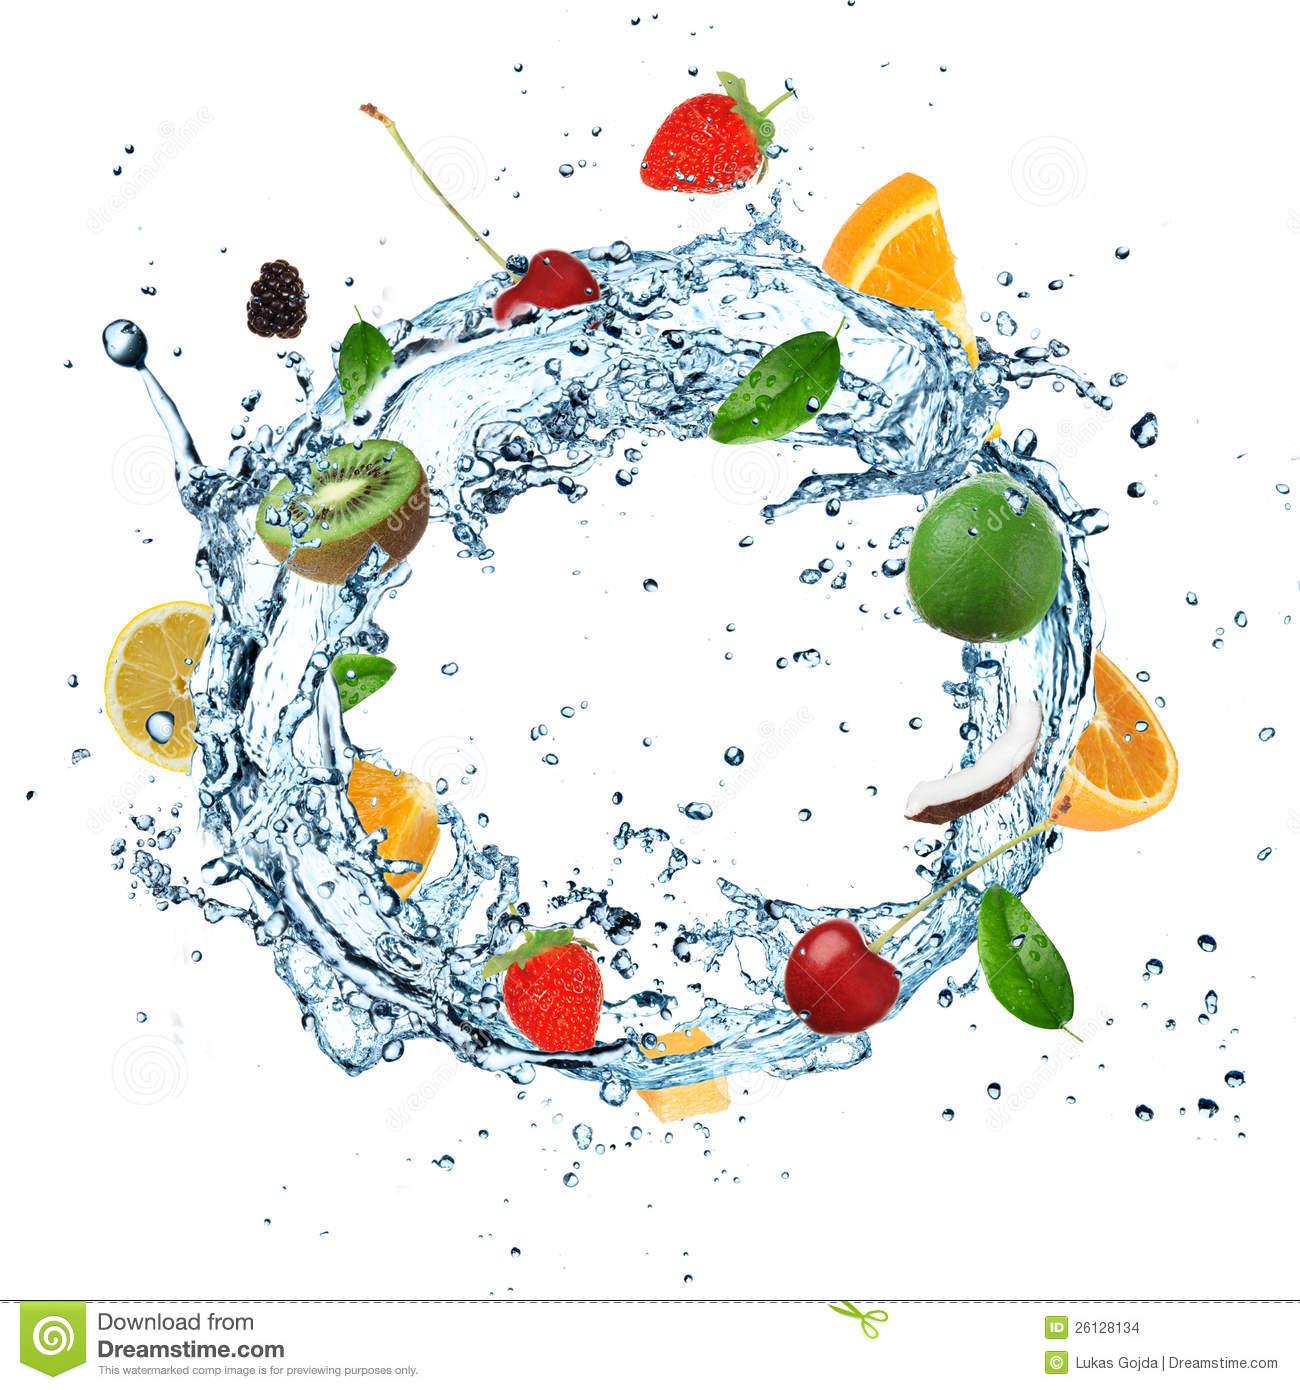 Fruit Water splash - Fruit Water Splash Clipart